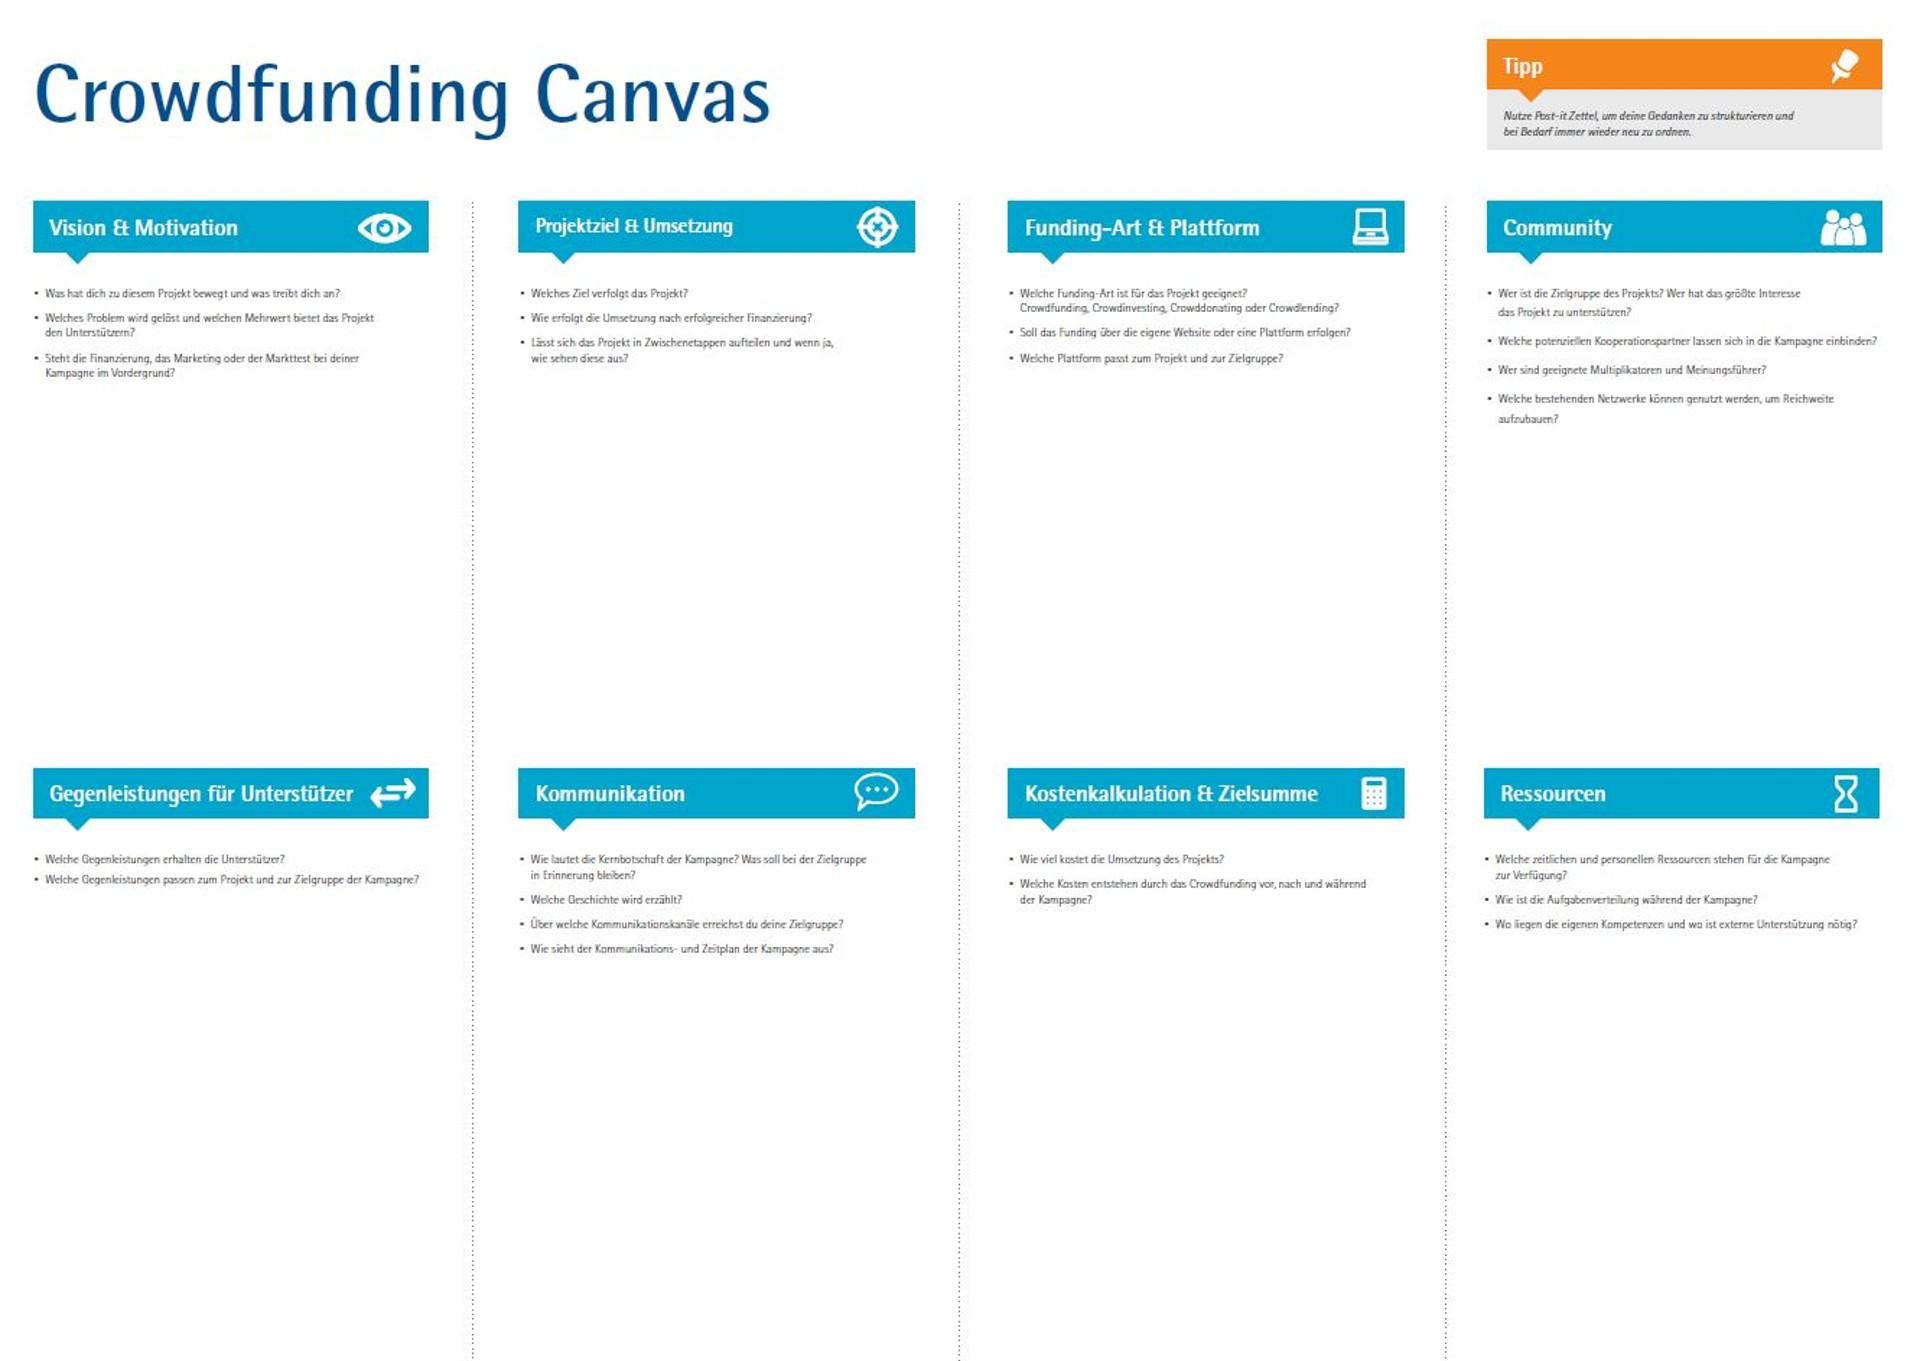 Ihk Crowdfunding Canvas